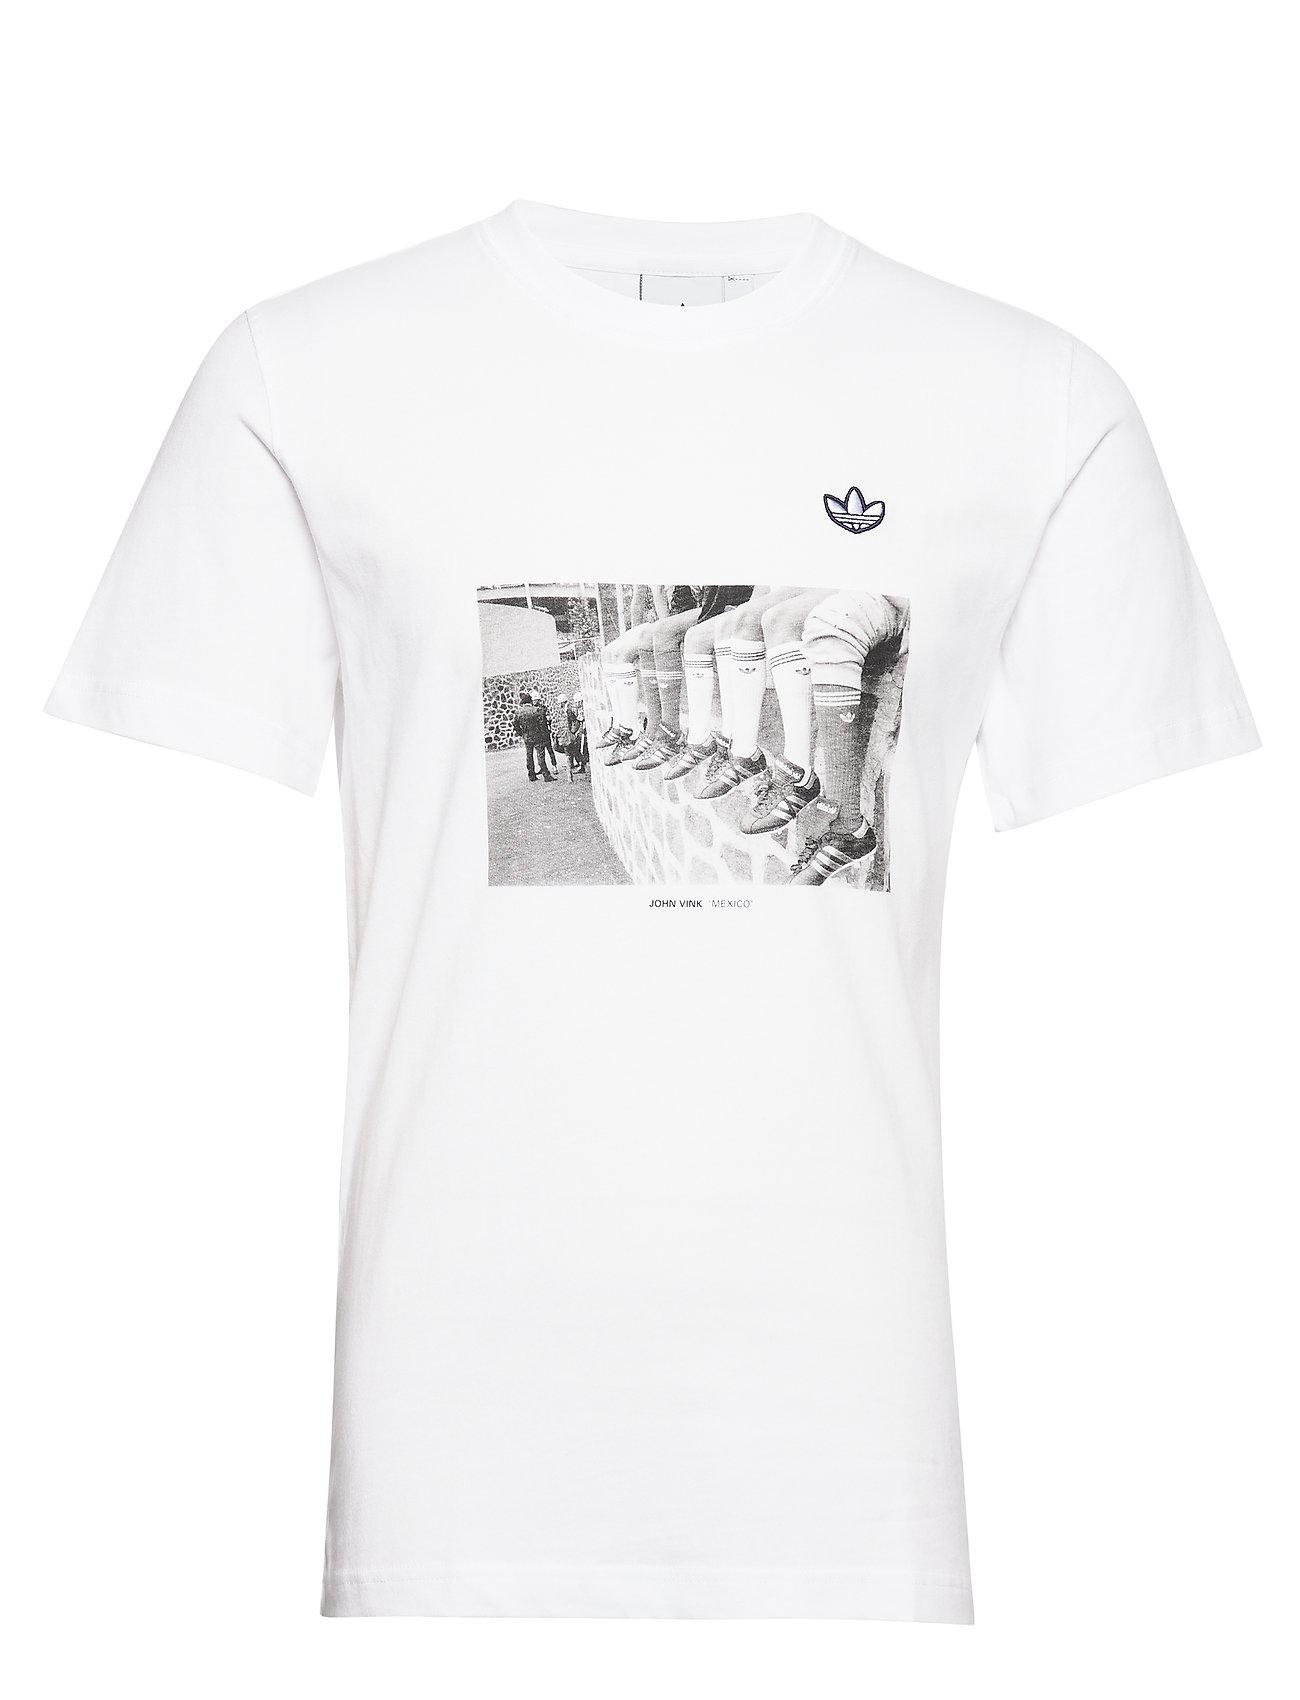 adidas Originals PHOTO TEE - WHITE/WHITE